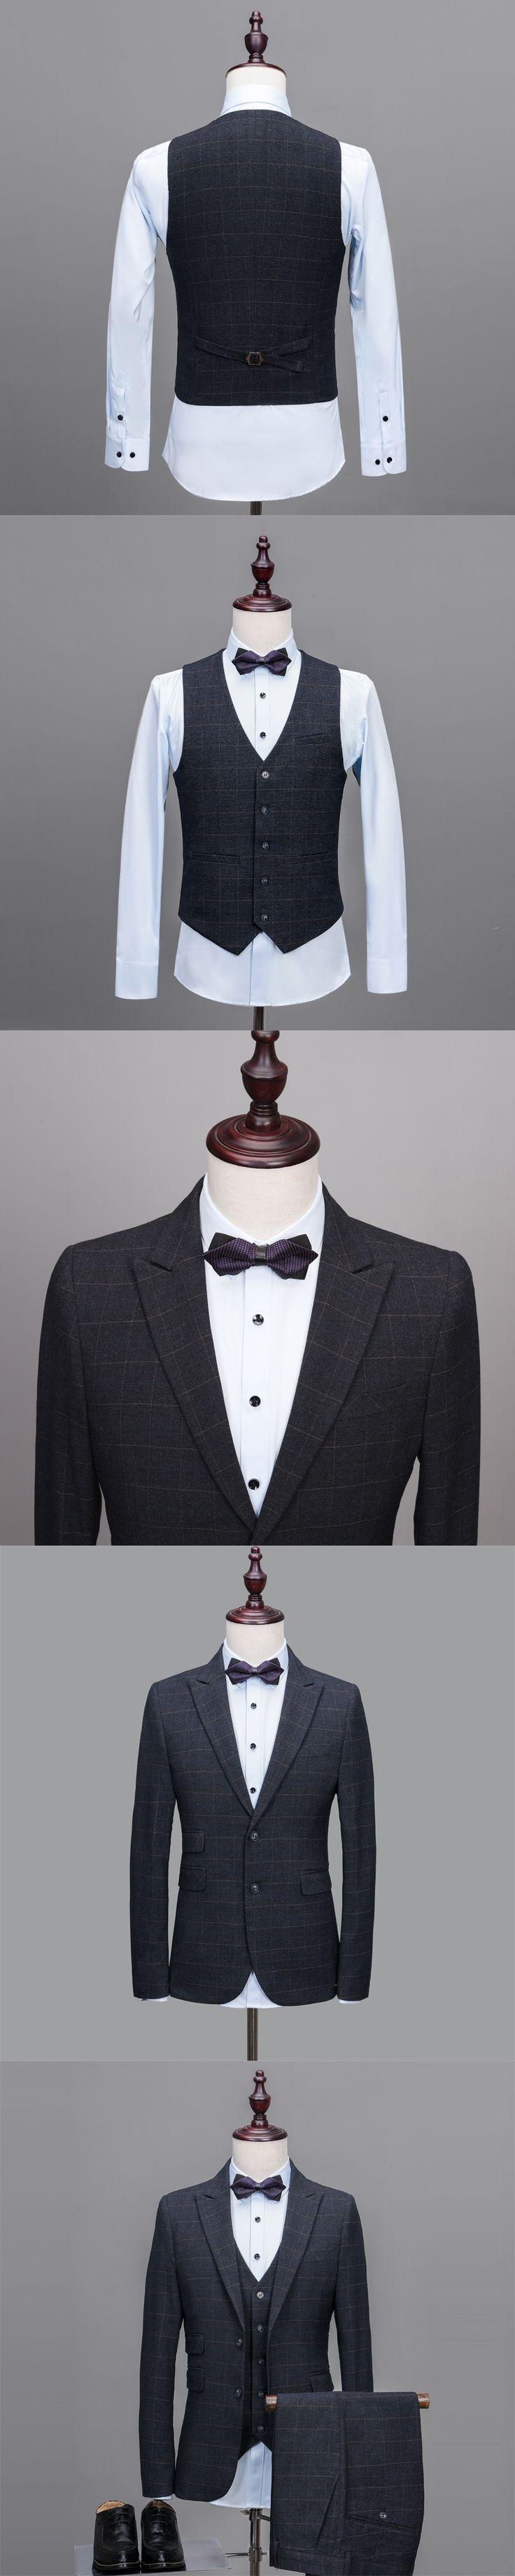 Latest Coat Pant Designs Dark Grey Tweed Suit Men Pattern Formal Prom Blazer Gentle Modern Groom Custom Tuxedo 3 Piece Terno nm